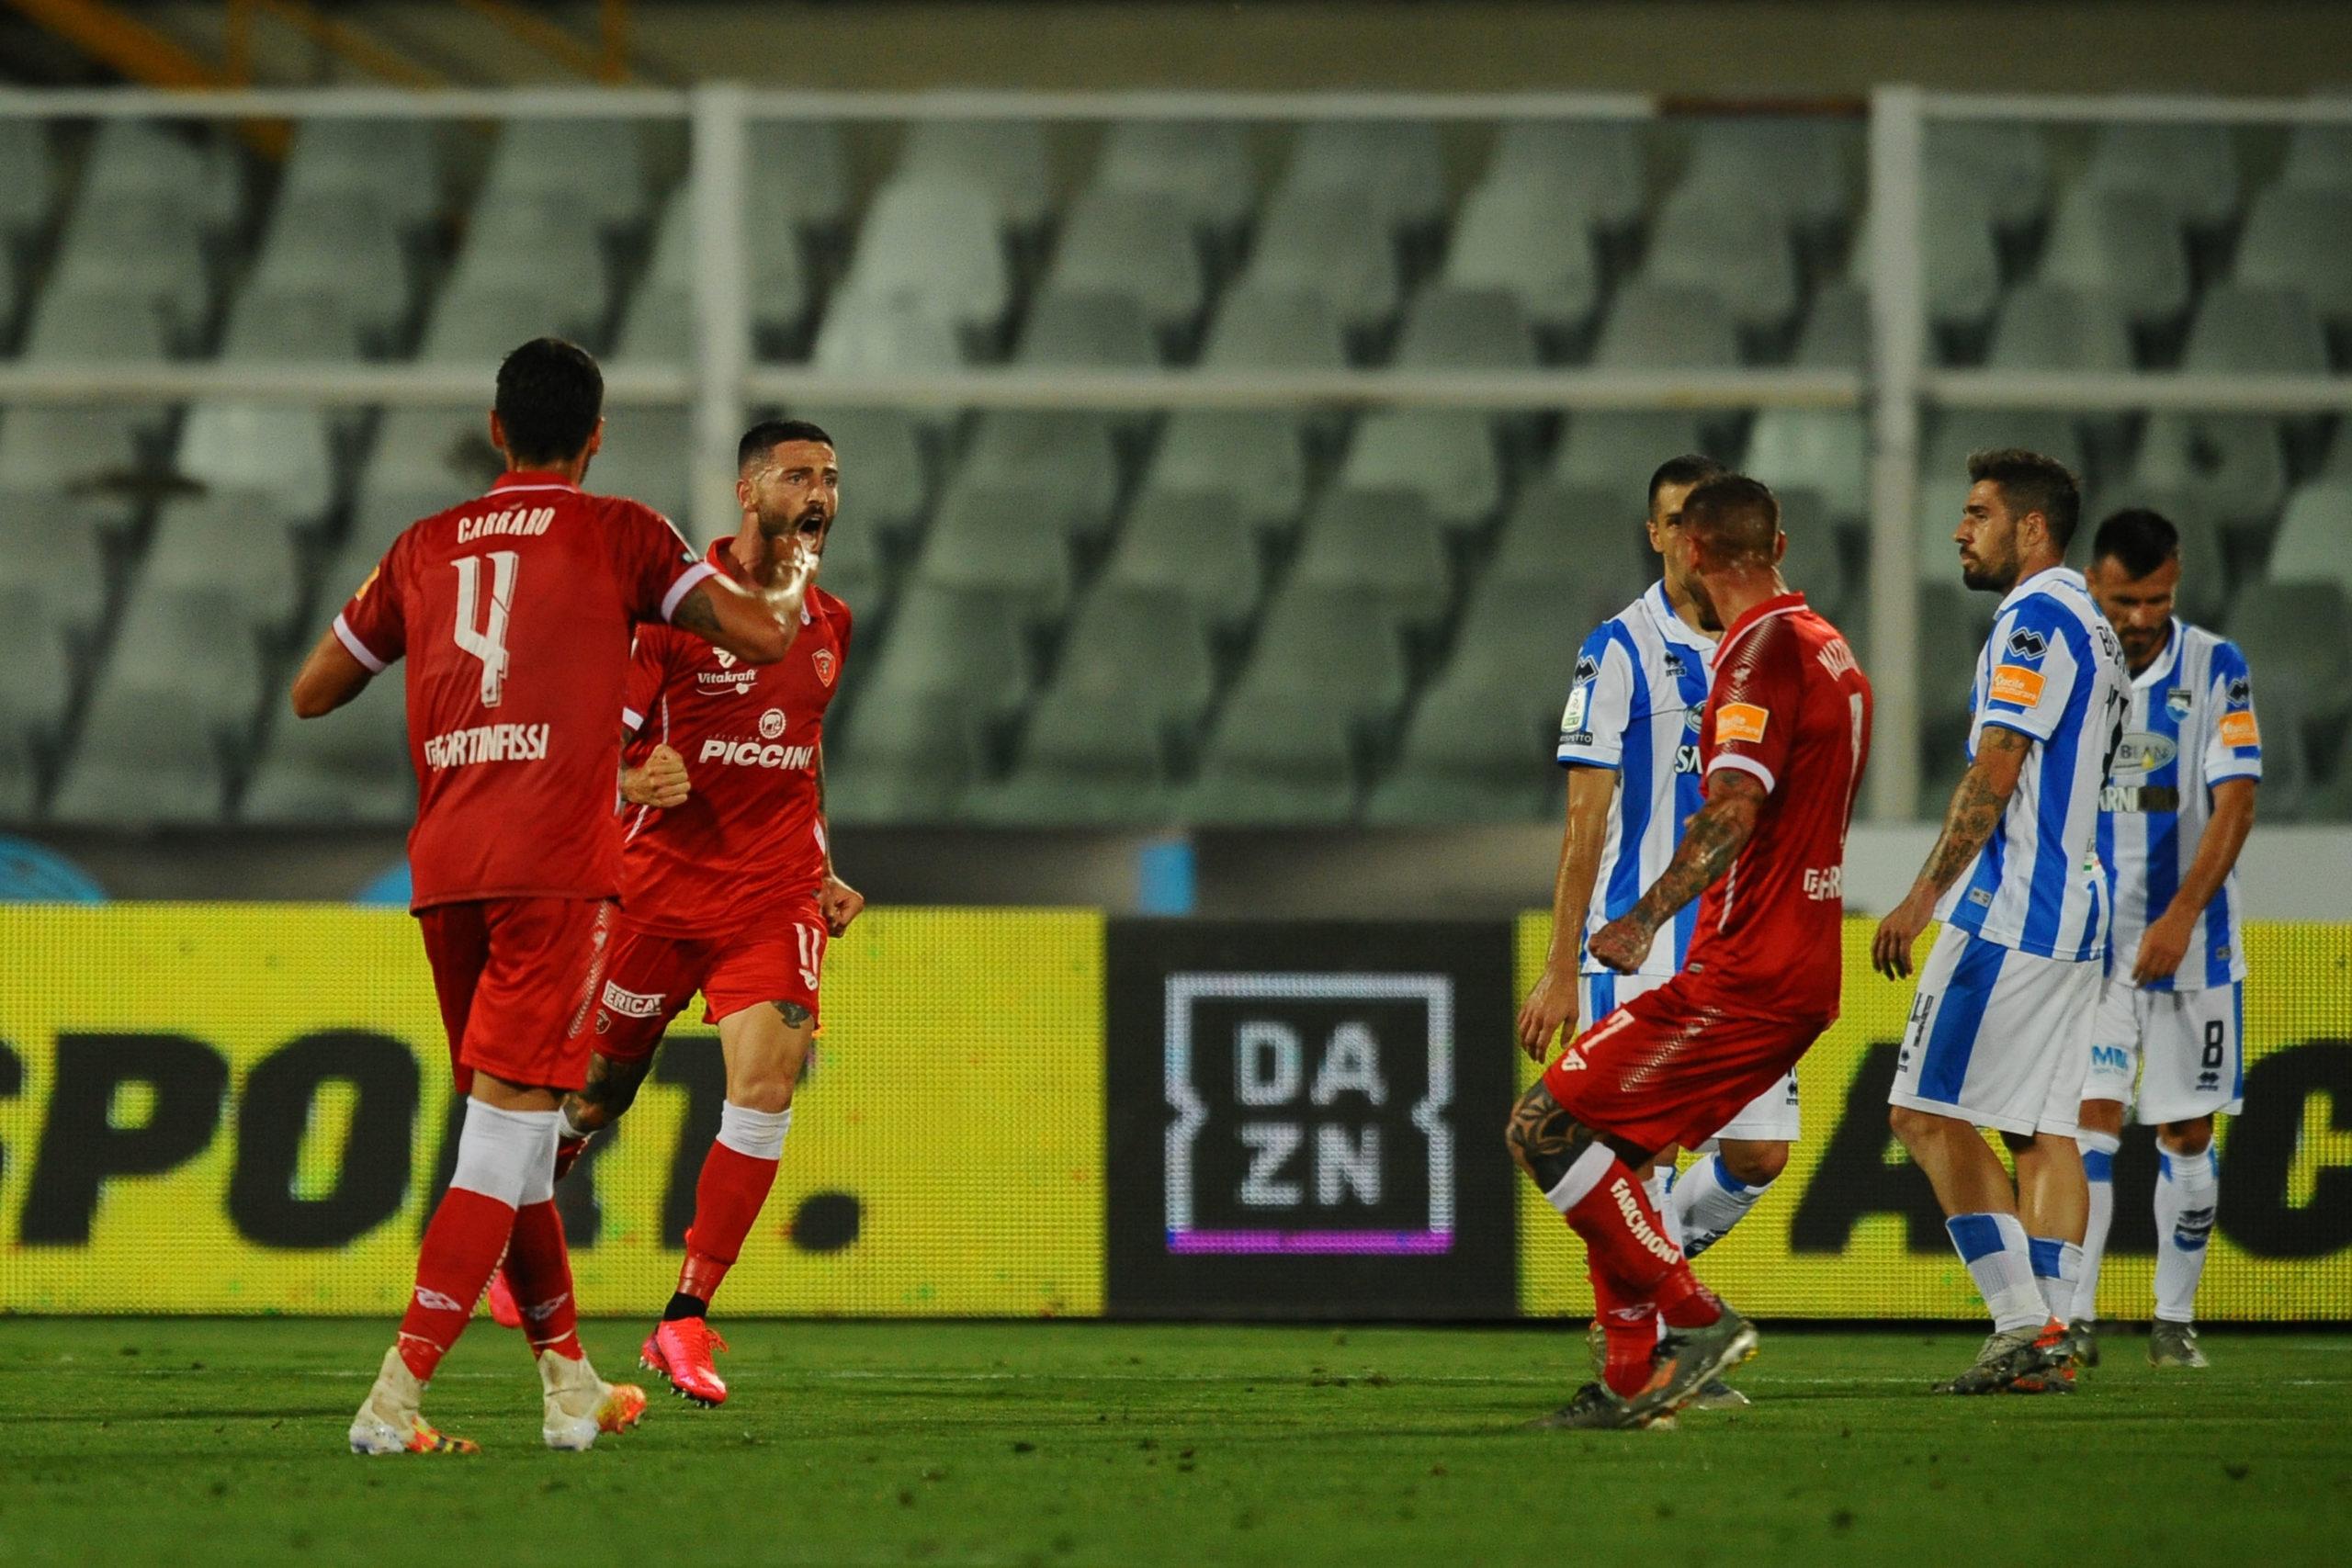 DAZN Serie B Play Out, Diretta Esclusiva Pescara - Perugia | Palinsesto e Telecronisti